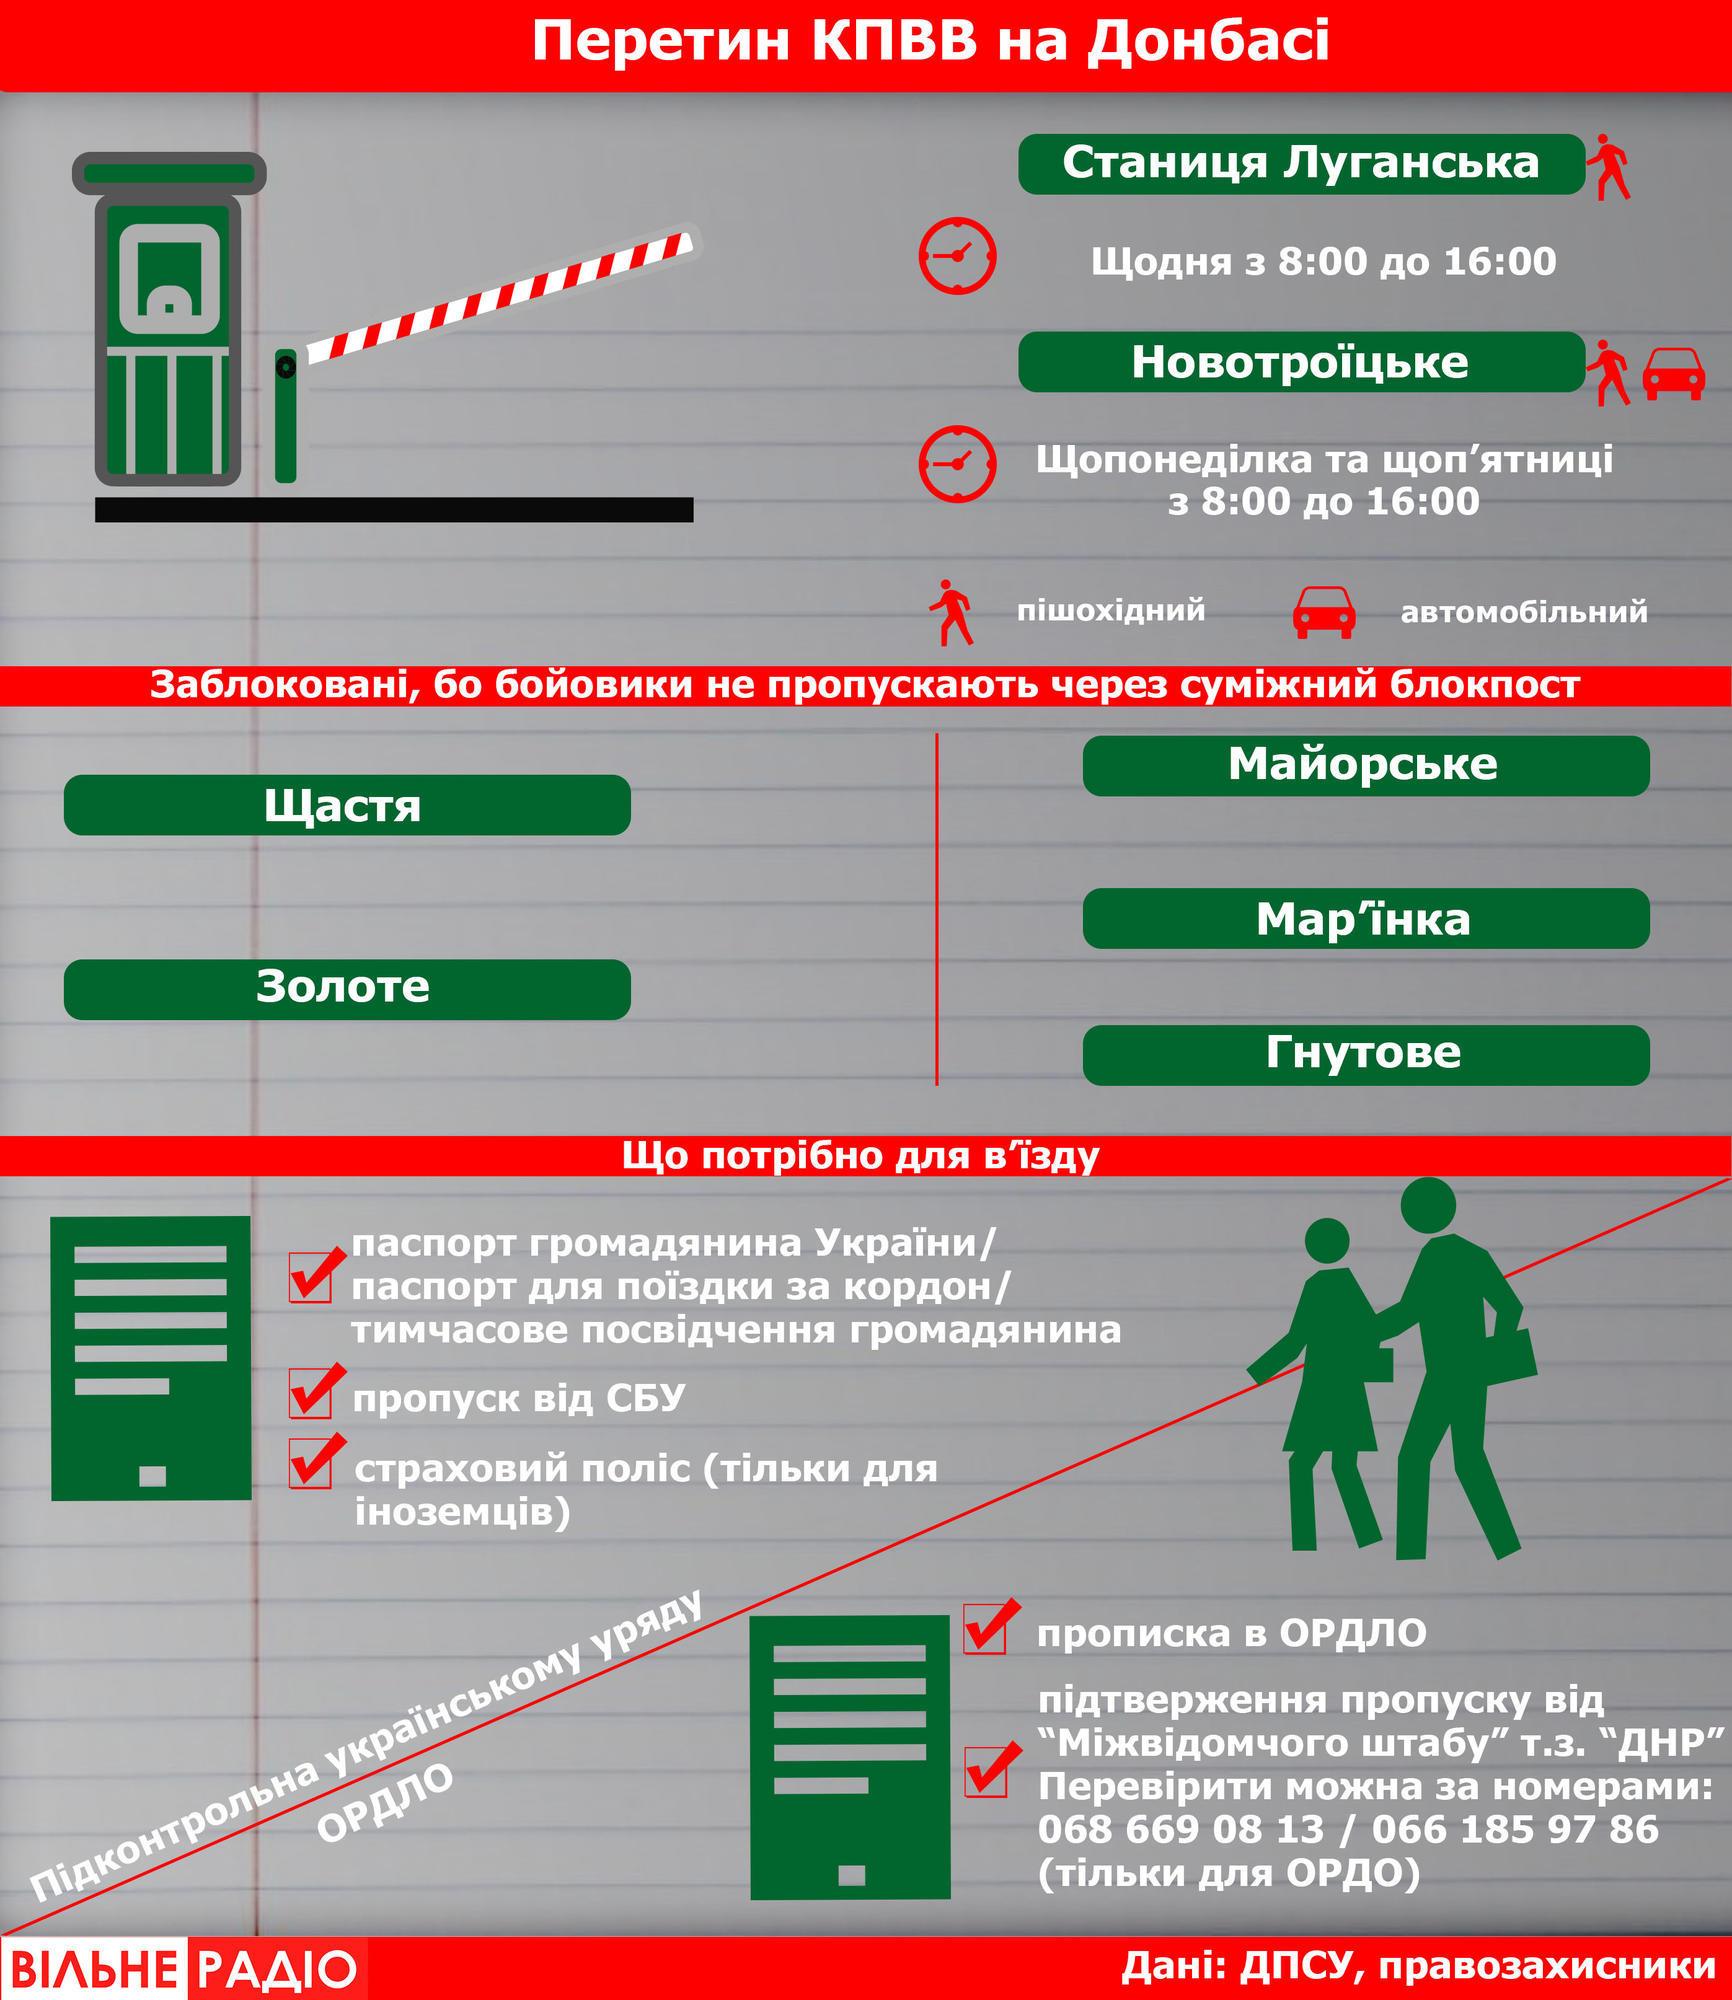 Умови перетину КПВВ Донбасу